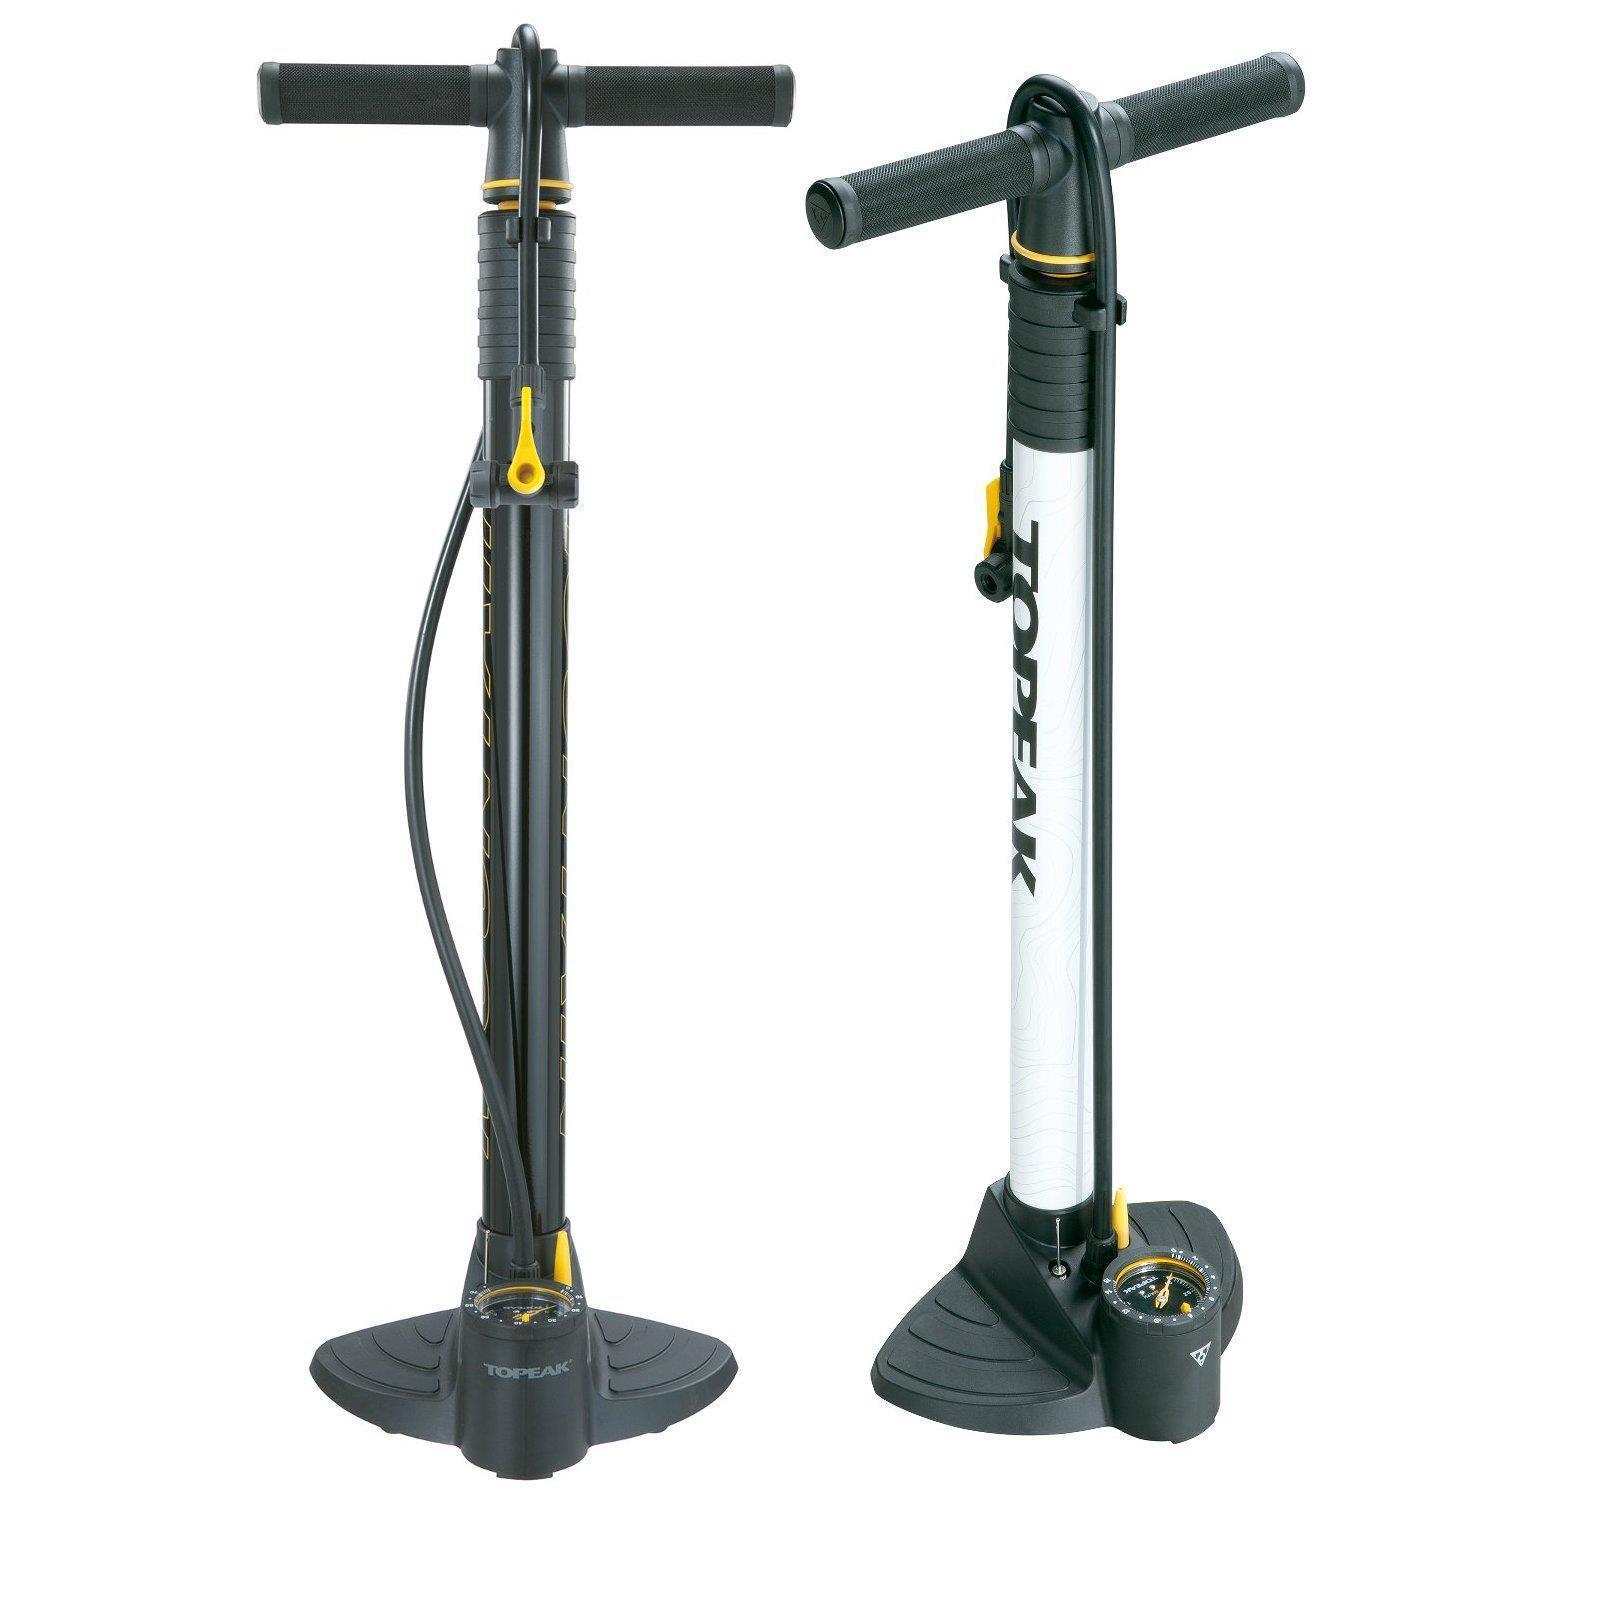 Topeak JoeBlow Fat Luftpumpe FatBike Reifen Reifen FatBike Standpumpe Joe Blow Pumpe FAT Bike 036641